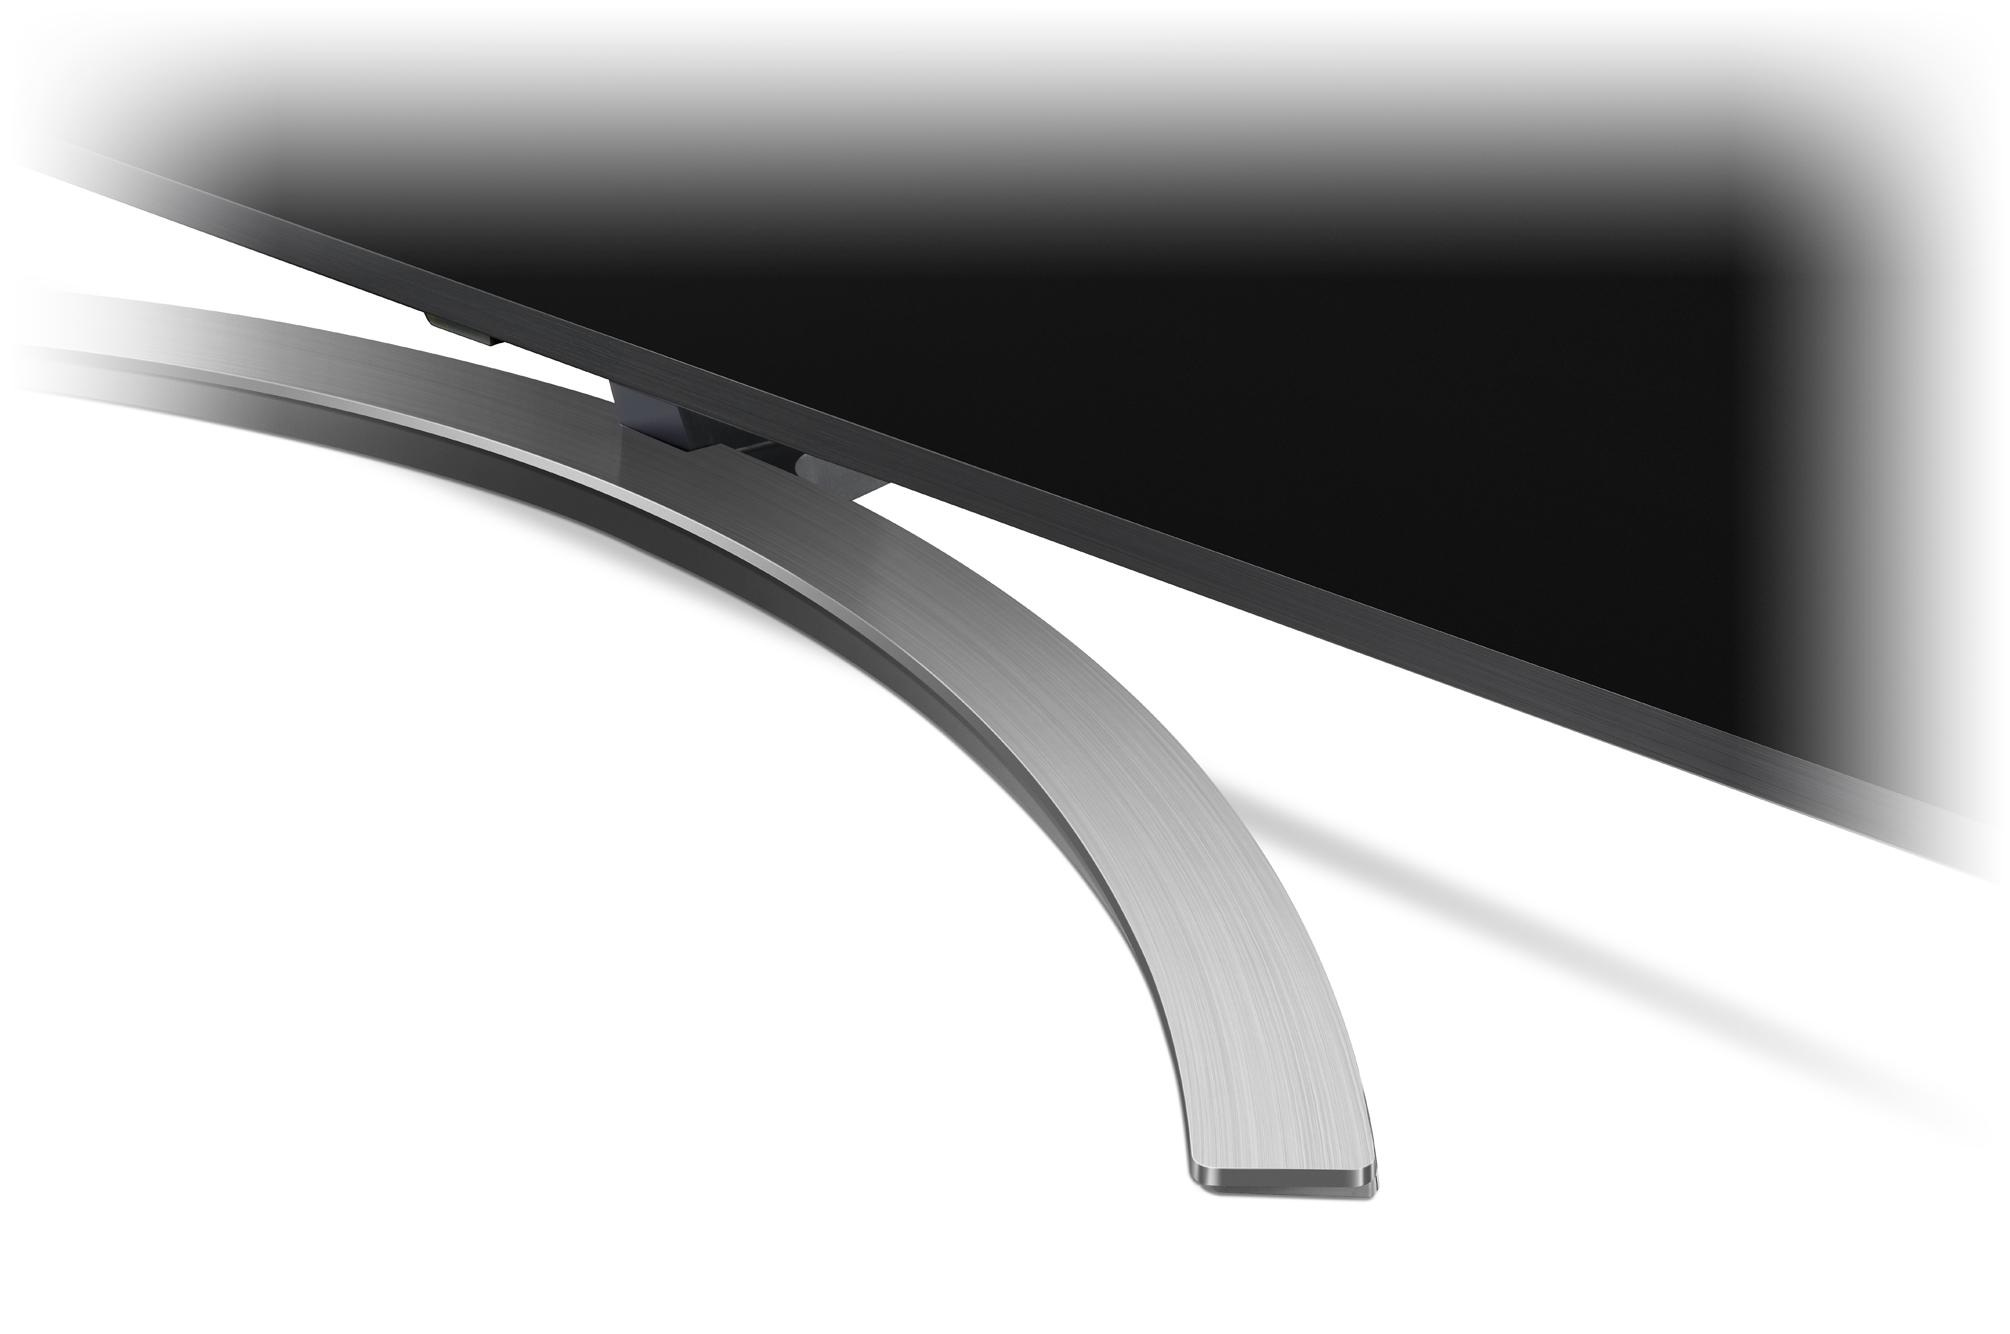 LG Pro:Centric SMART 65UT761H (ASIA)